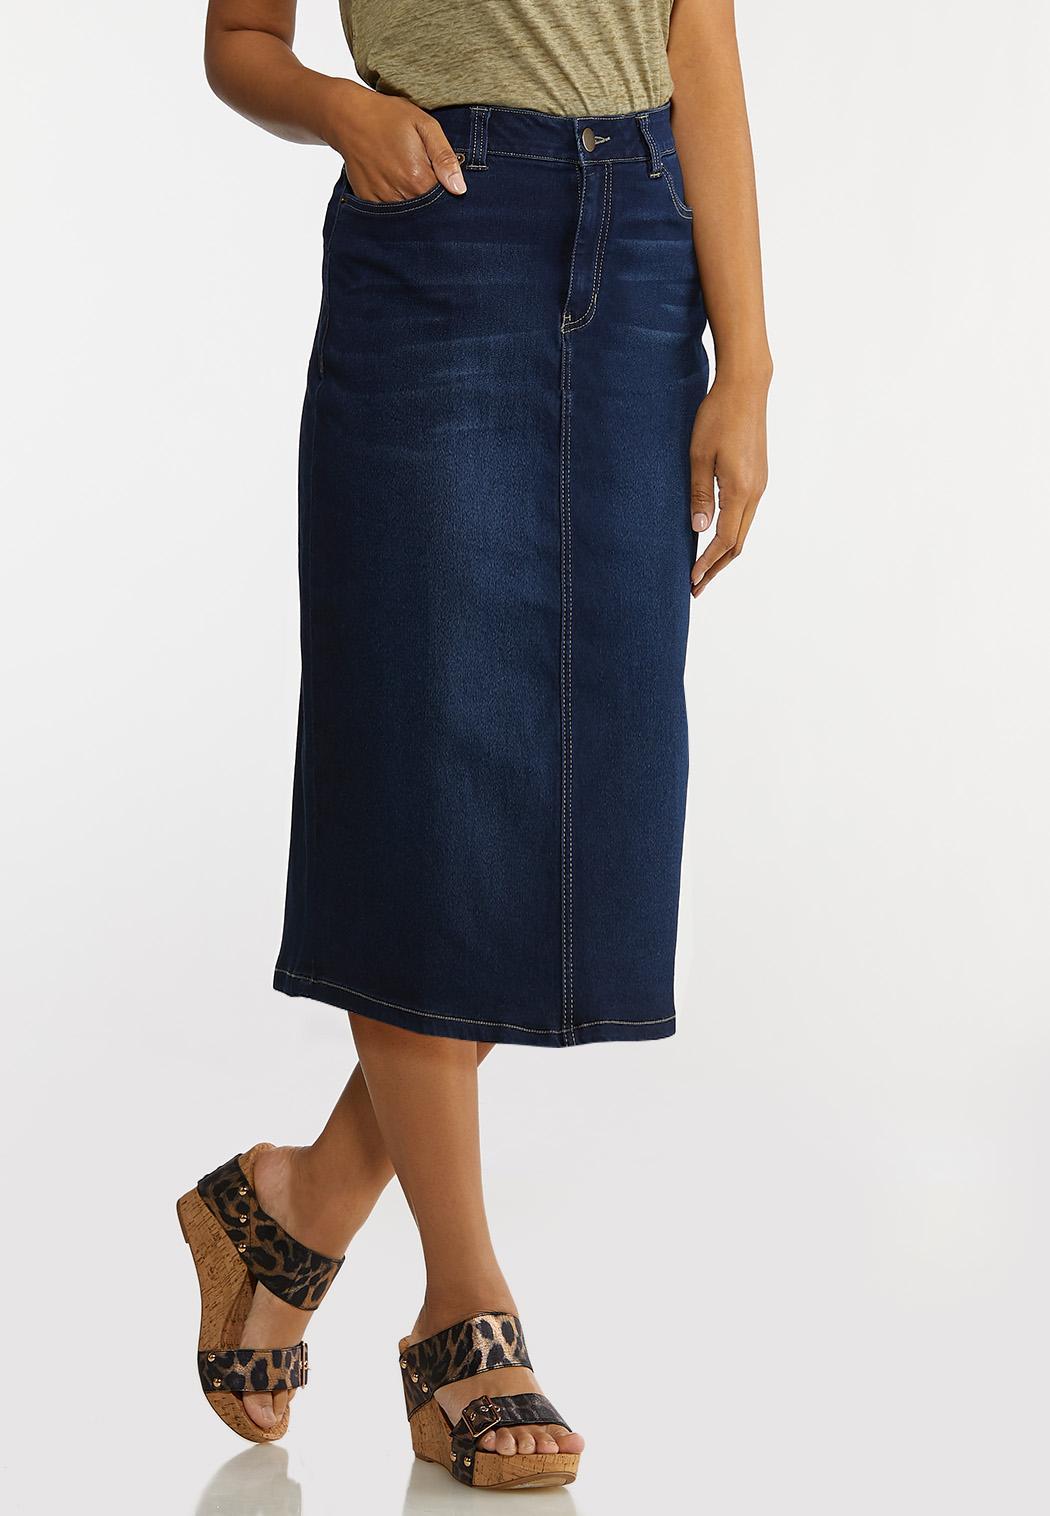 Plus Size Denim Pencil Skirt